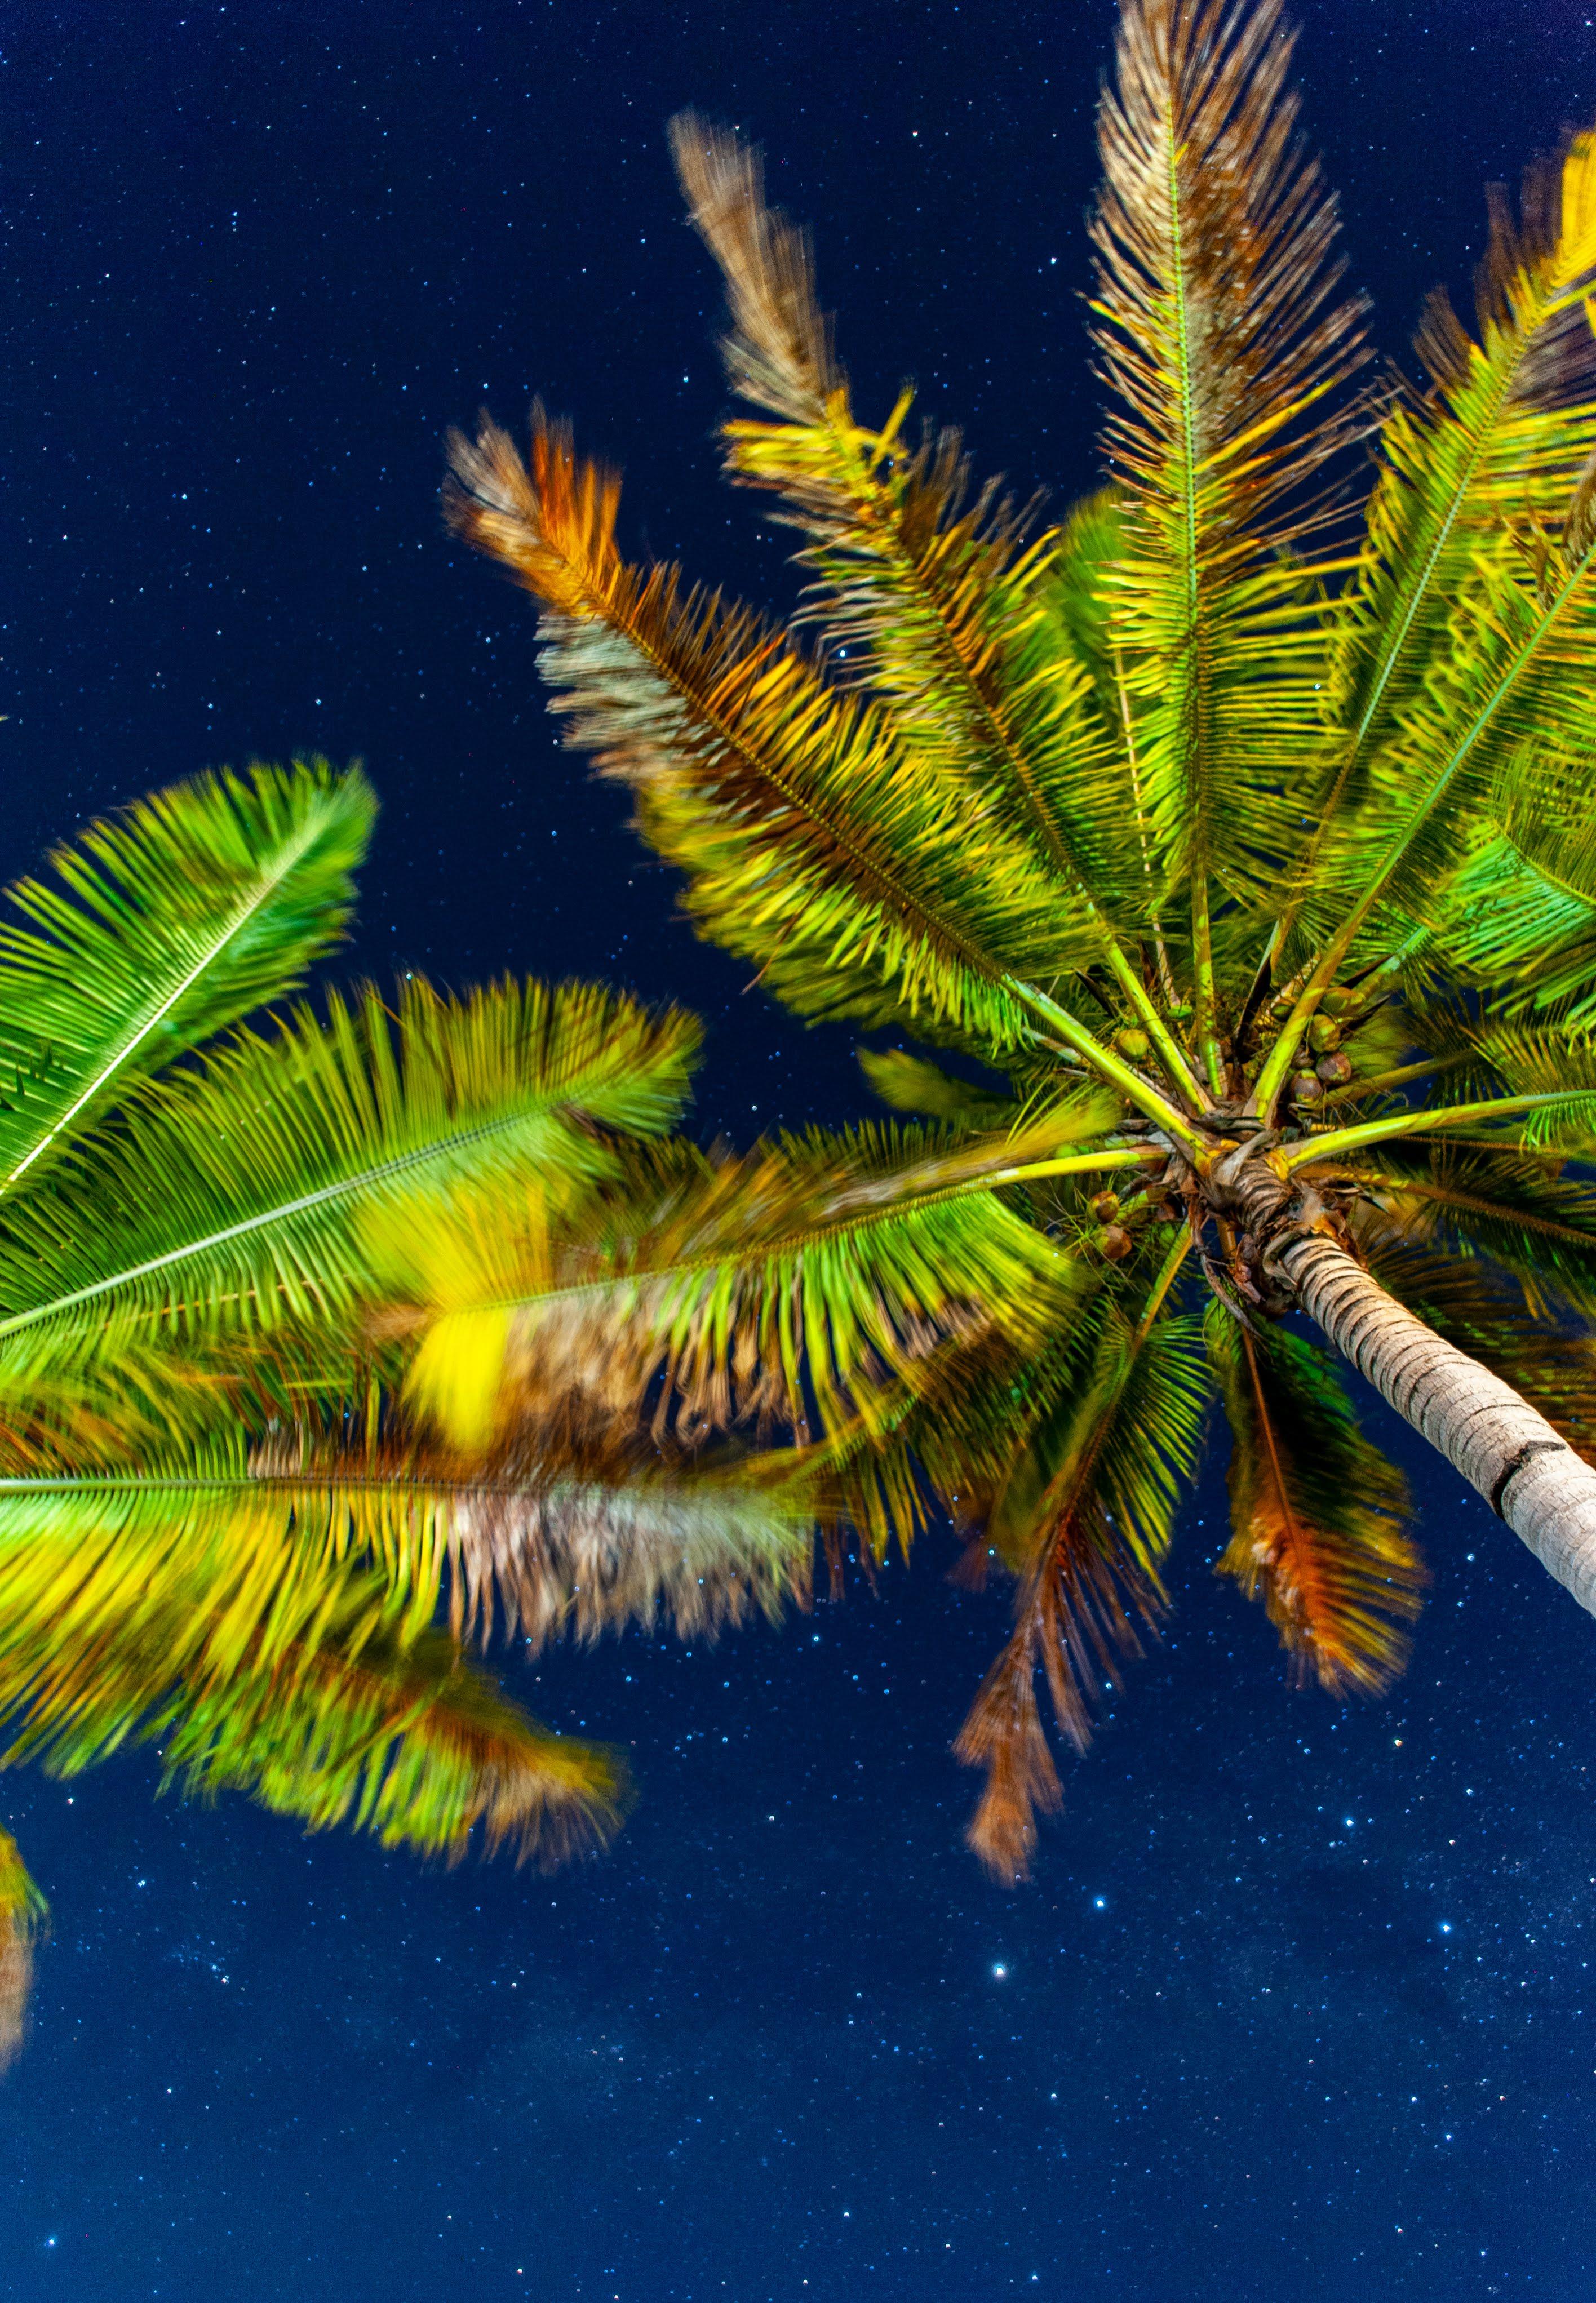 Palm trees under a starry night sky